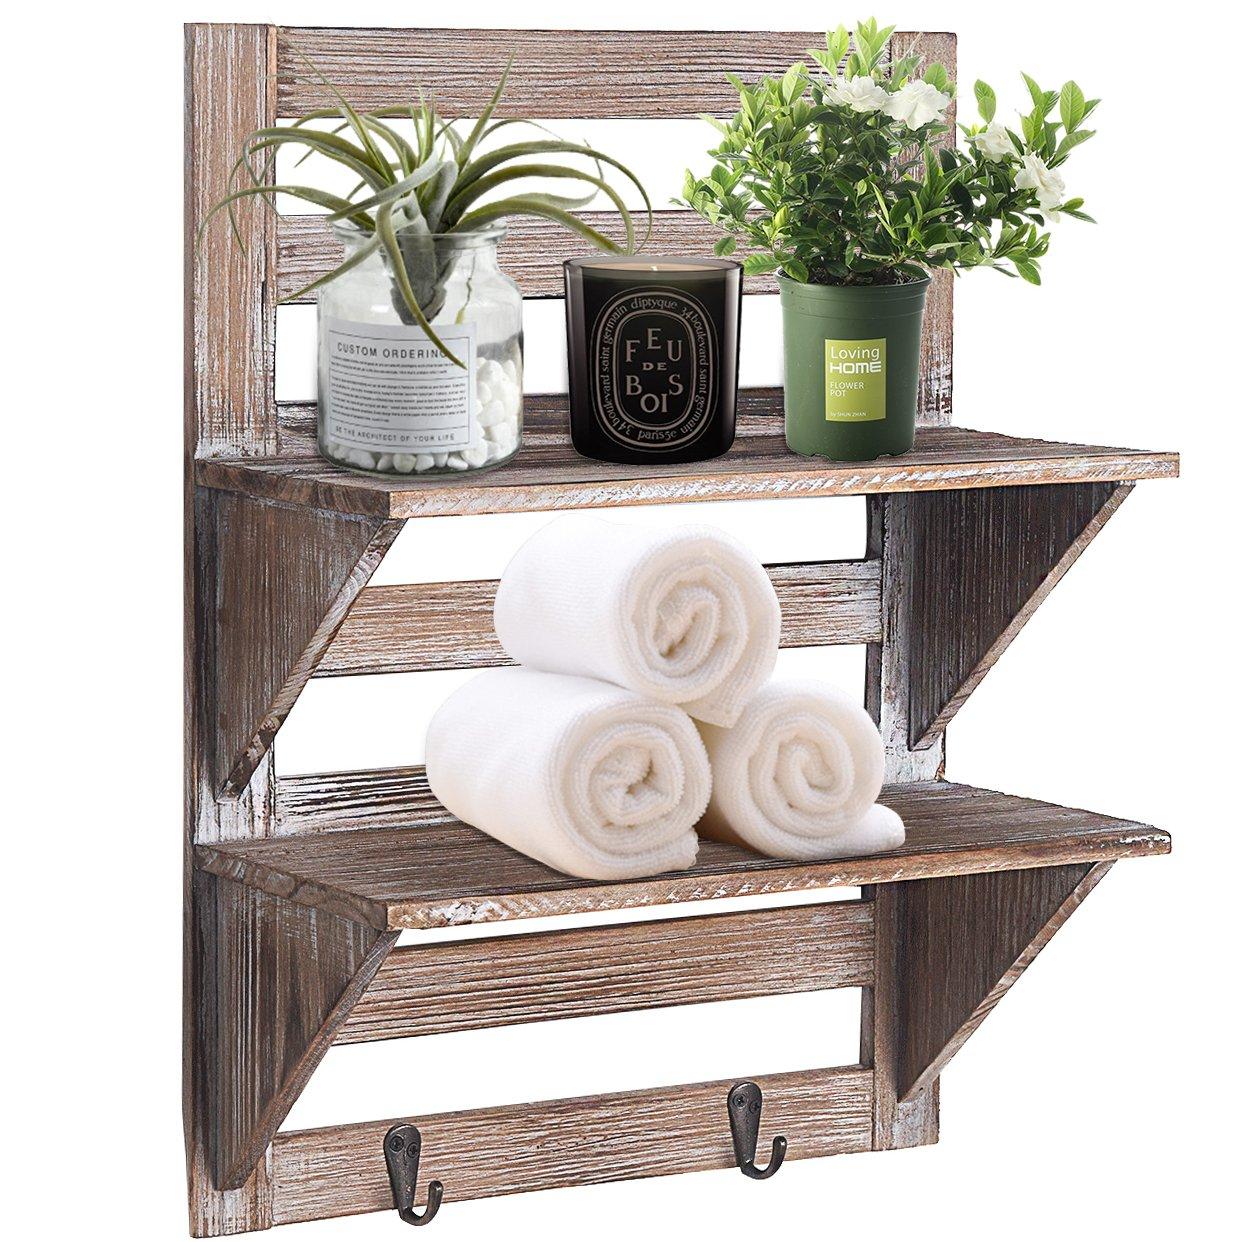 RHF Rustic Farmhouse Decor, Bathroom Shelves of Real Wood, Pallet Shelf, Wood Storage Shelving Rack-2 Tier, Bathroom Shelf & Bathroom Decor, Wall Mounted Wood Rack with 2 Hooks, Nails Included Rose Home Fashion